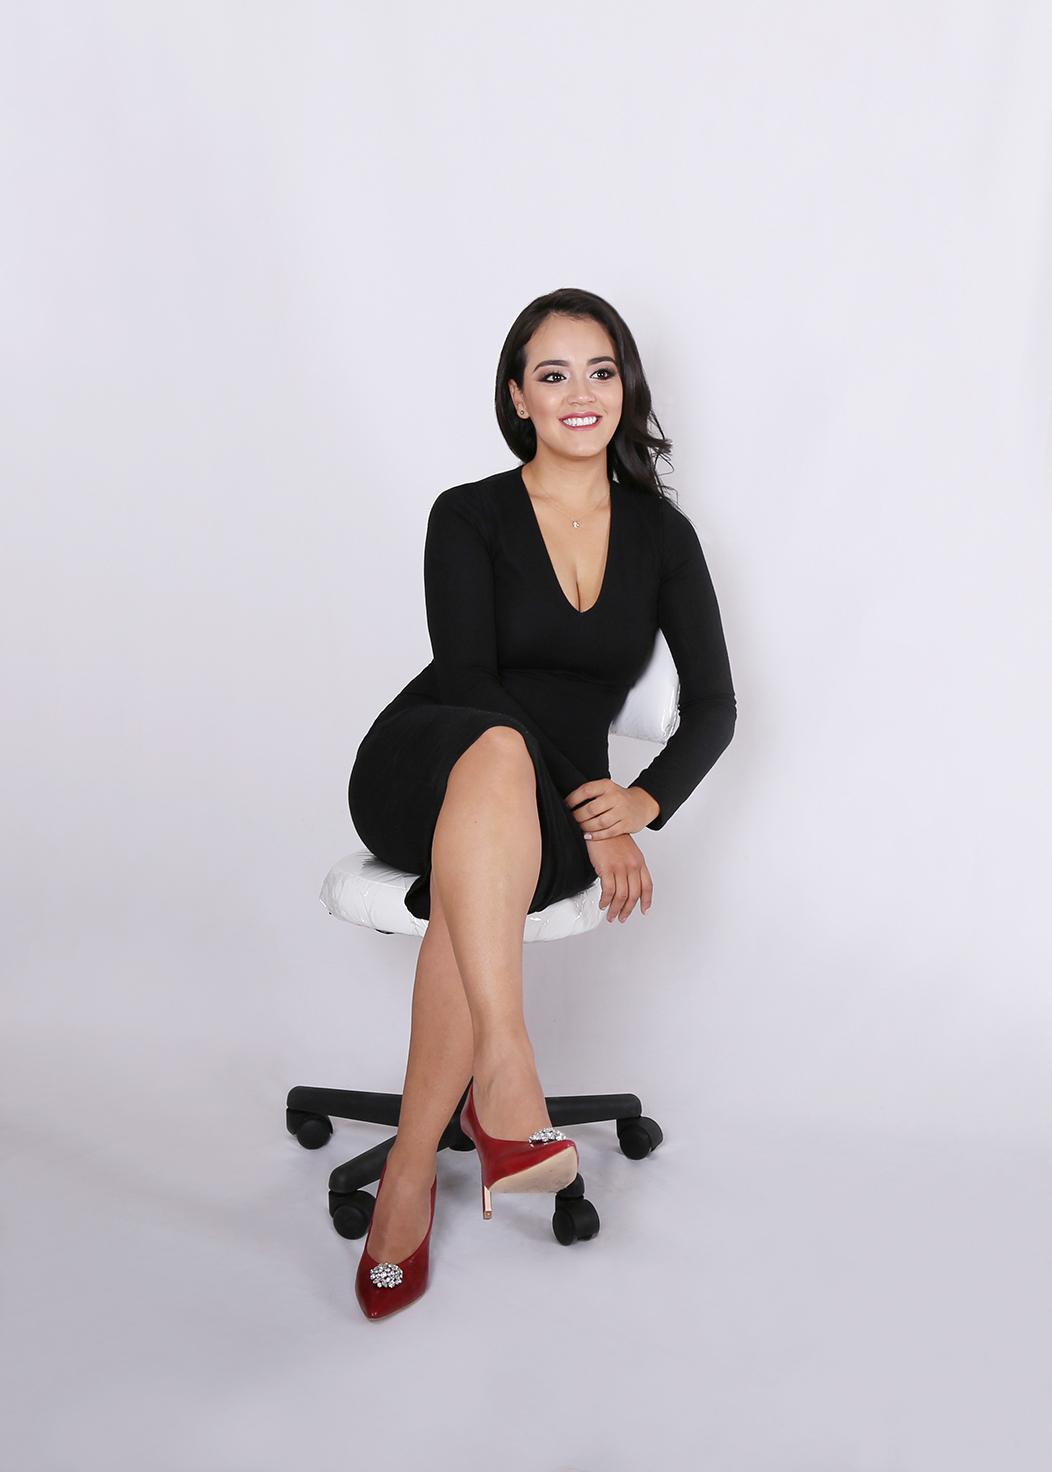 Maroge-Angela-Velazquez-fotografia-sesiones-diseño-52